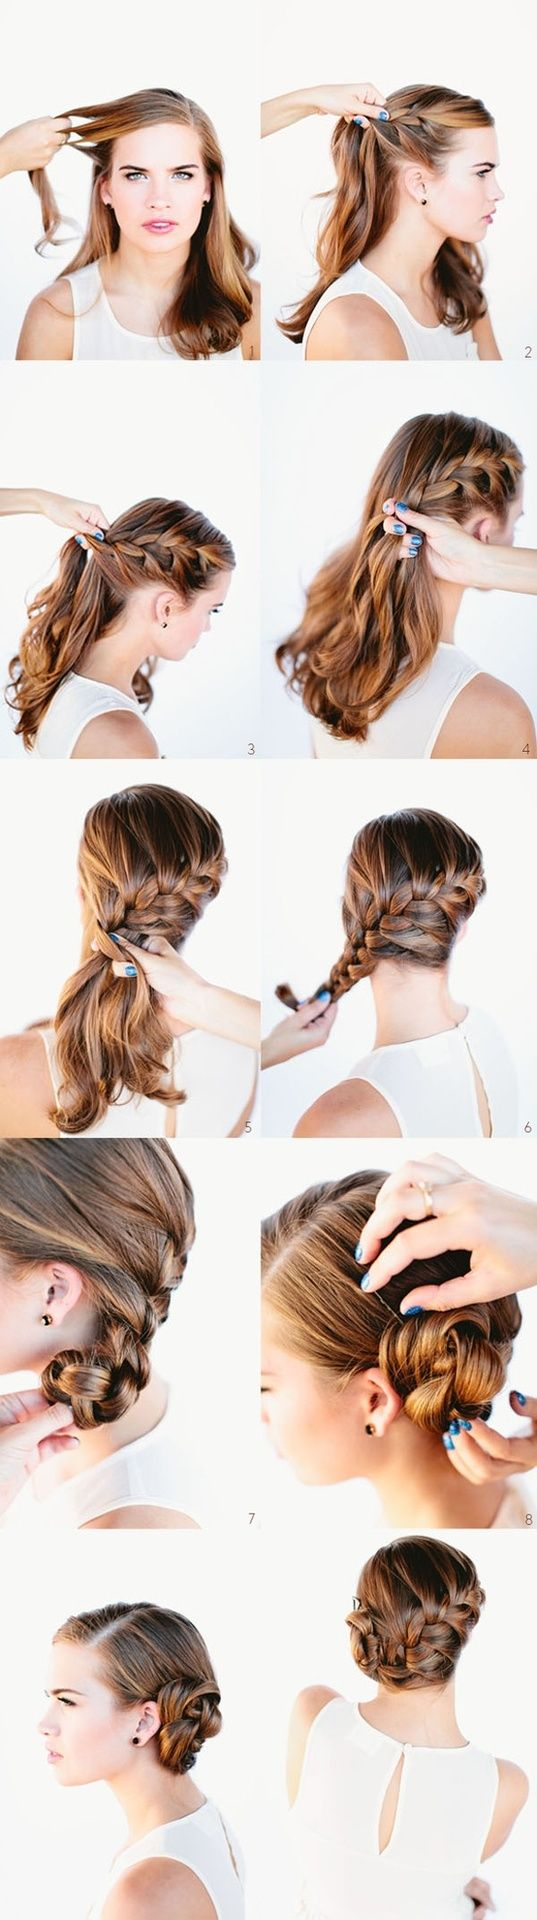 Terrific 1000 Images About Diy Braids On Pinterest Short Hairstyles Gunalazisus